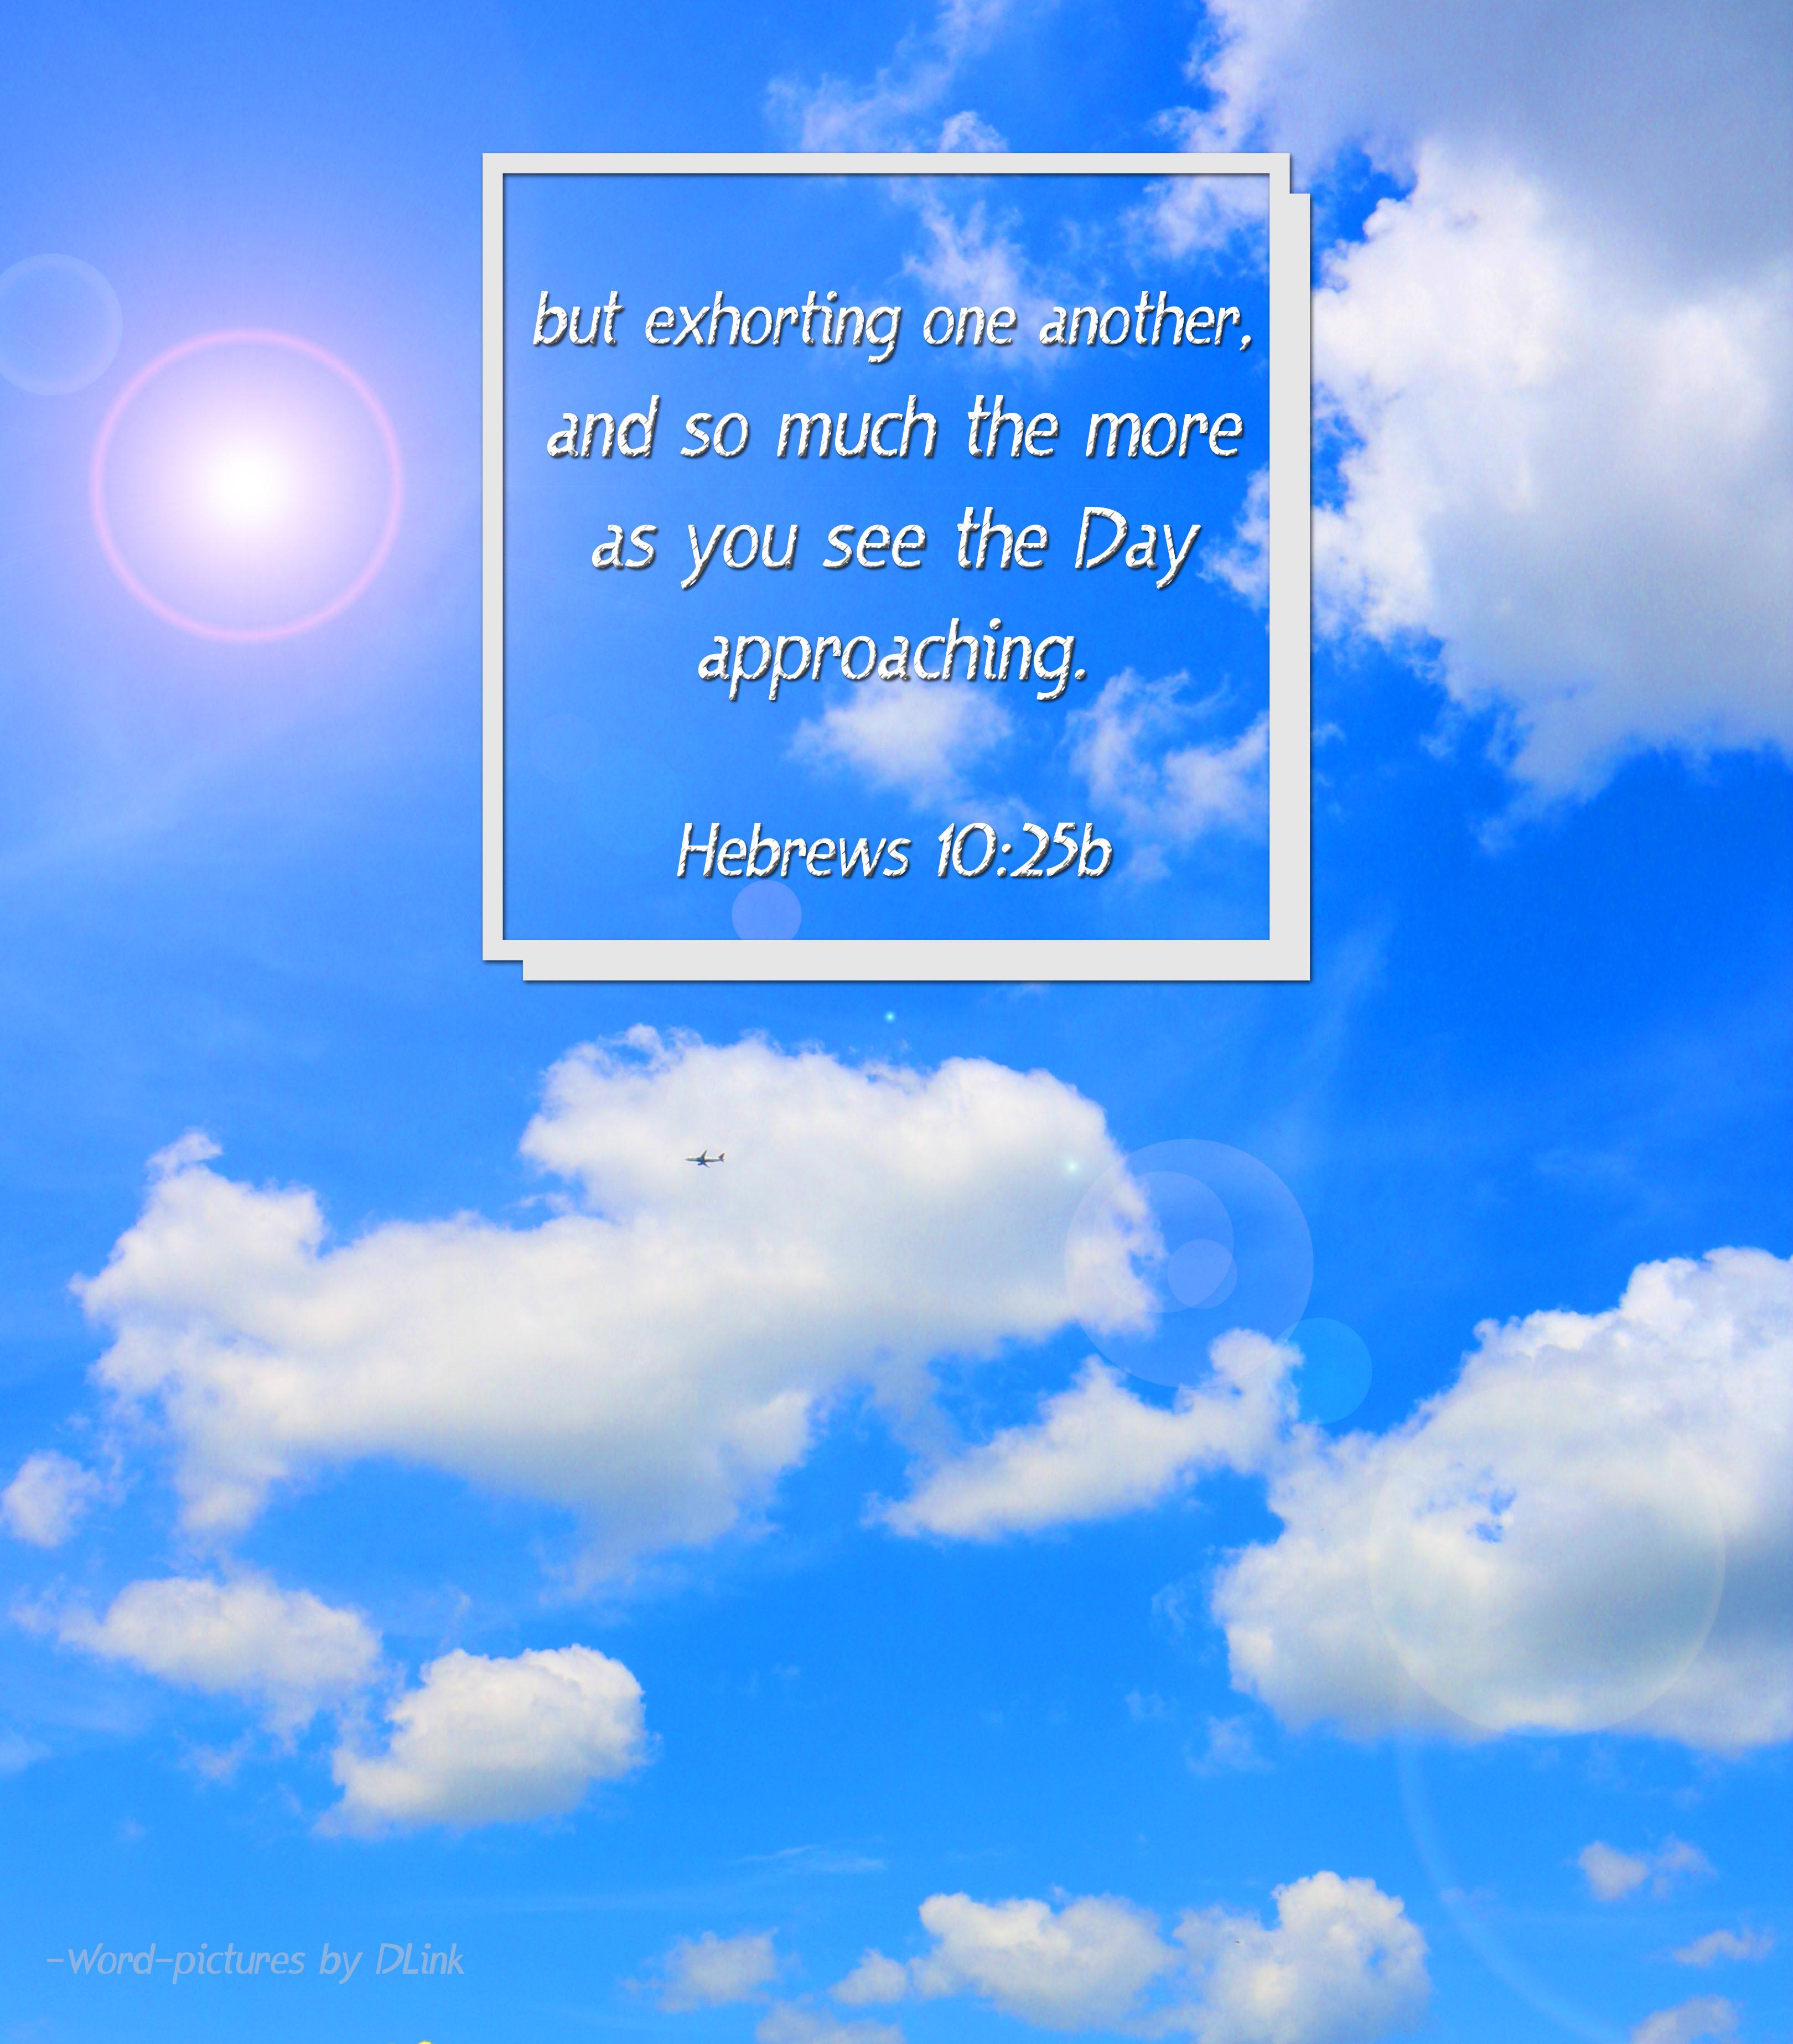 Hebrews 10;25b